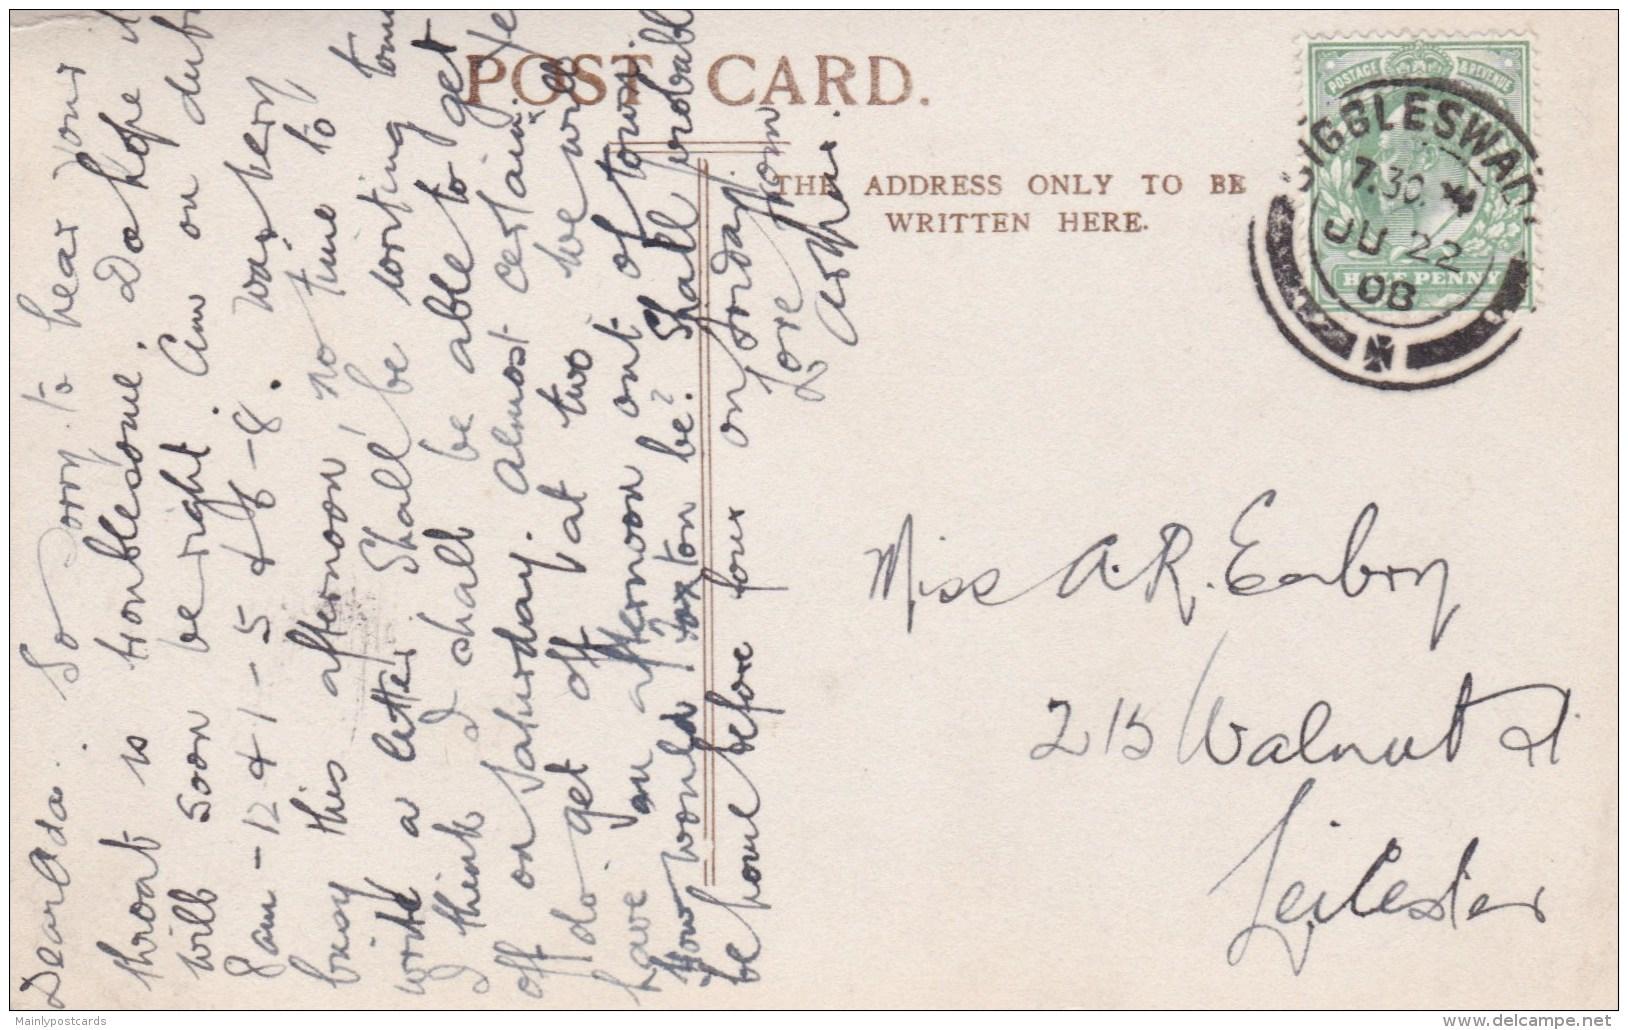 AM73 Elmer Keene Postcard - The Ouse, Bedford - Bedford